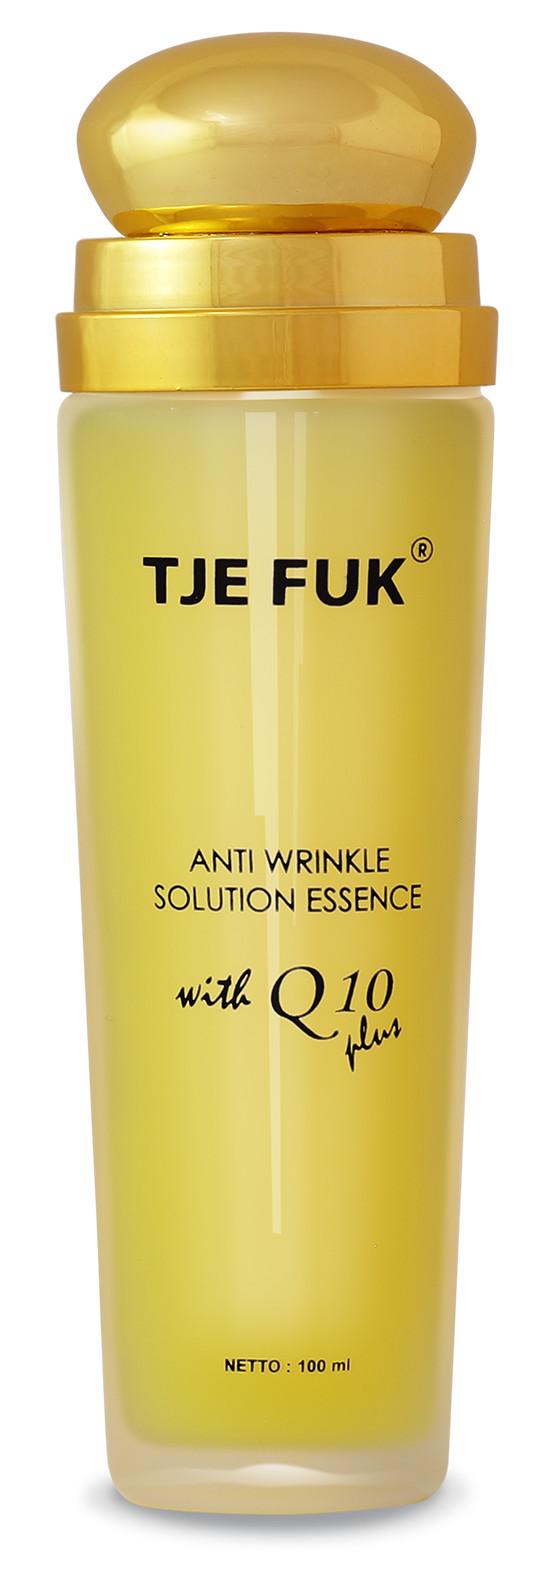 Beli Tje Fuk Wrinkle Essence Anti Aging Q10 Harga Rp 260000 Night Cream Whitening Original